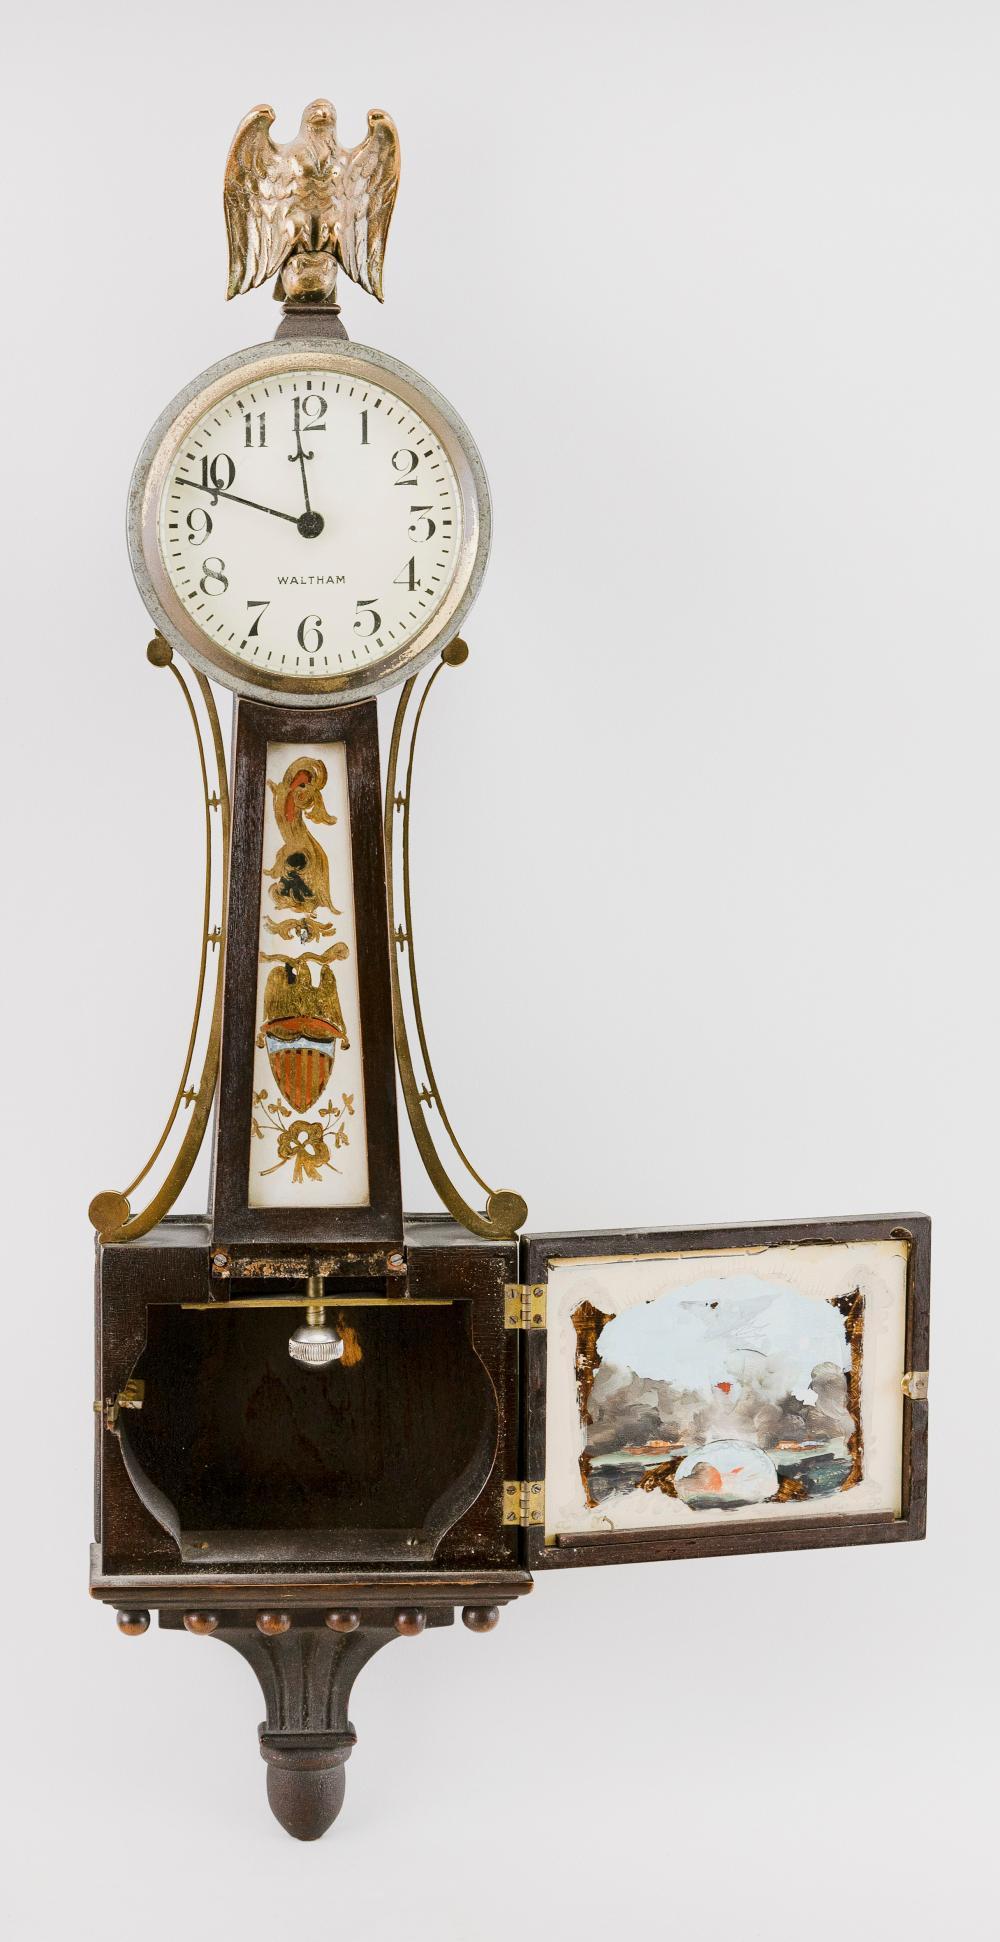 WALTHAM BANJO CLOCK 20th Century Height 21